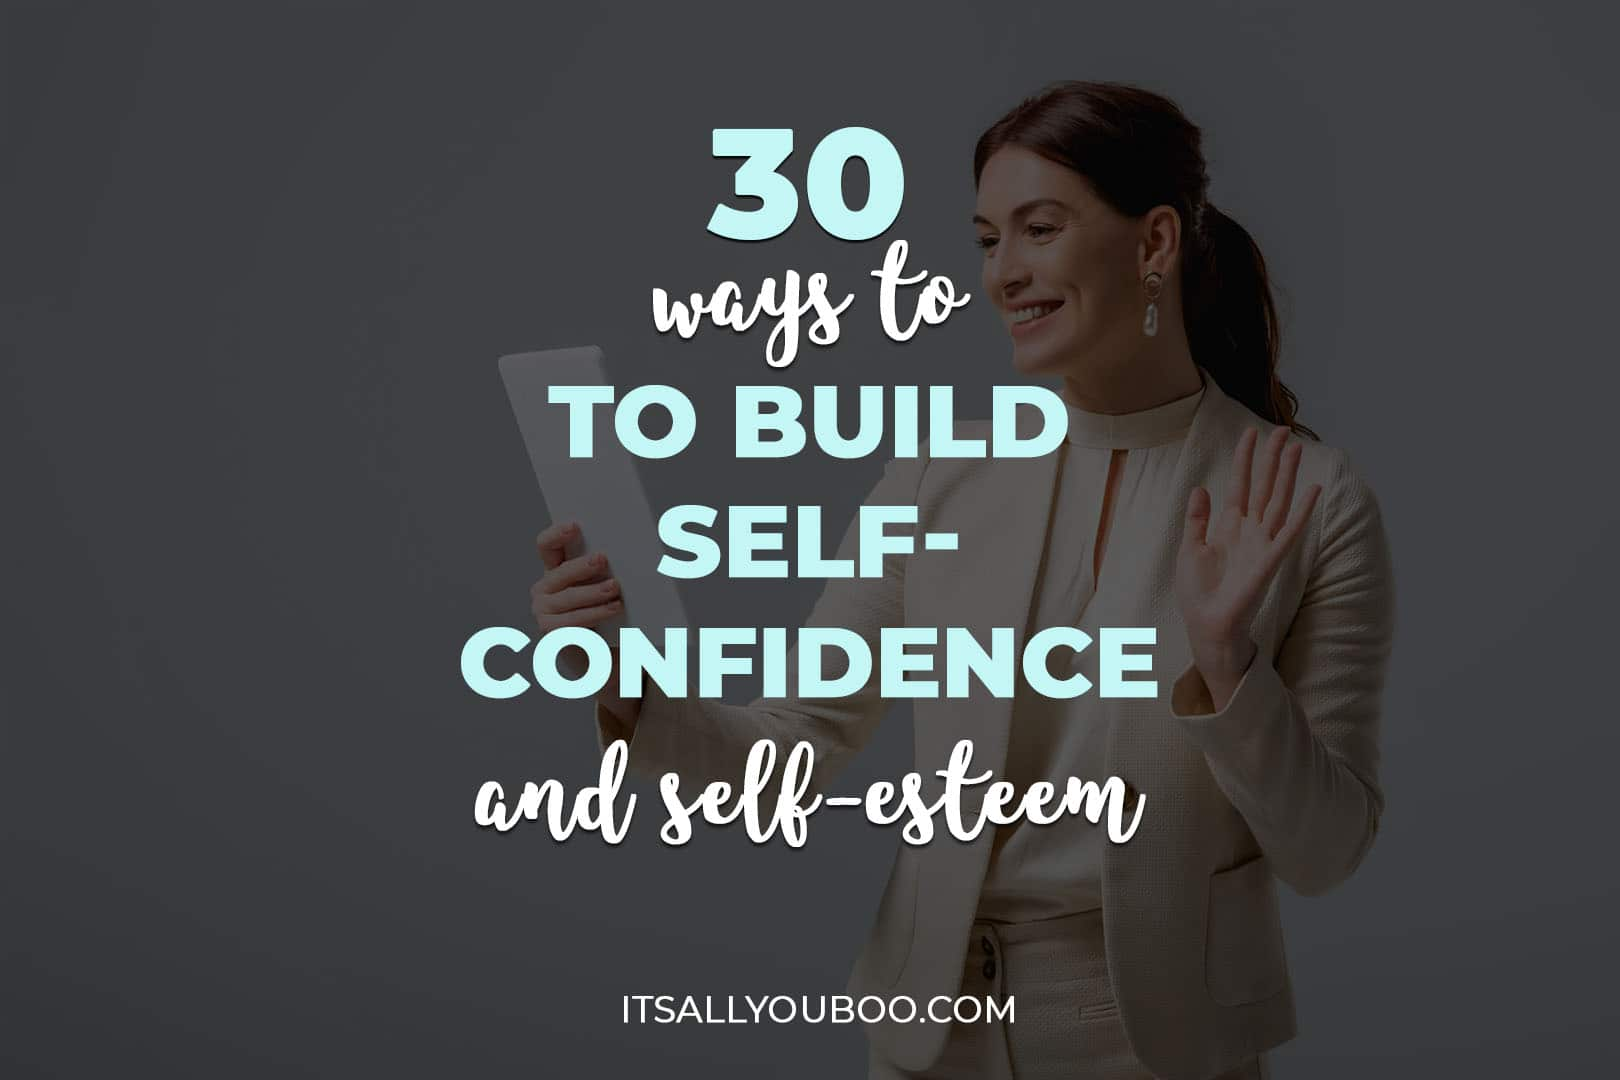 30 Ways to Build Self-Confidence and Self-Esteem